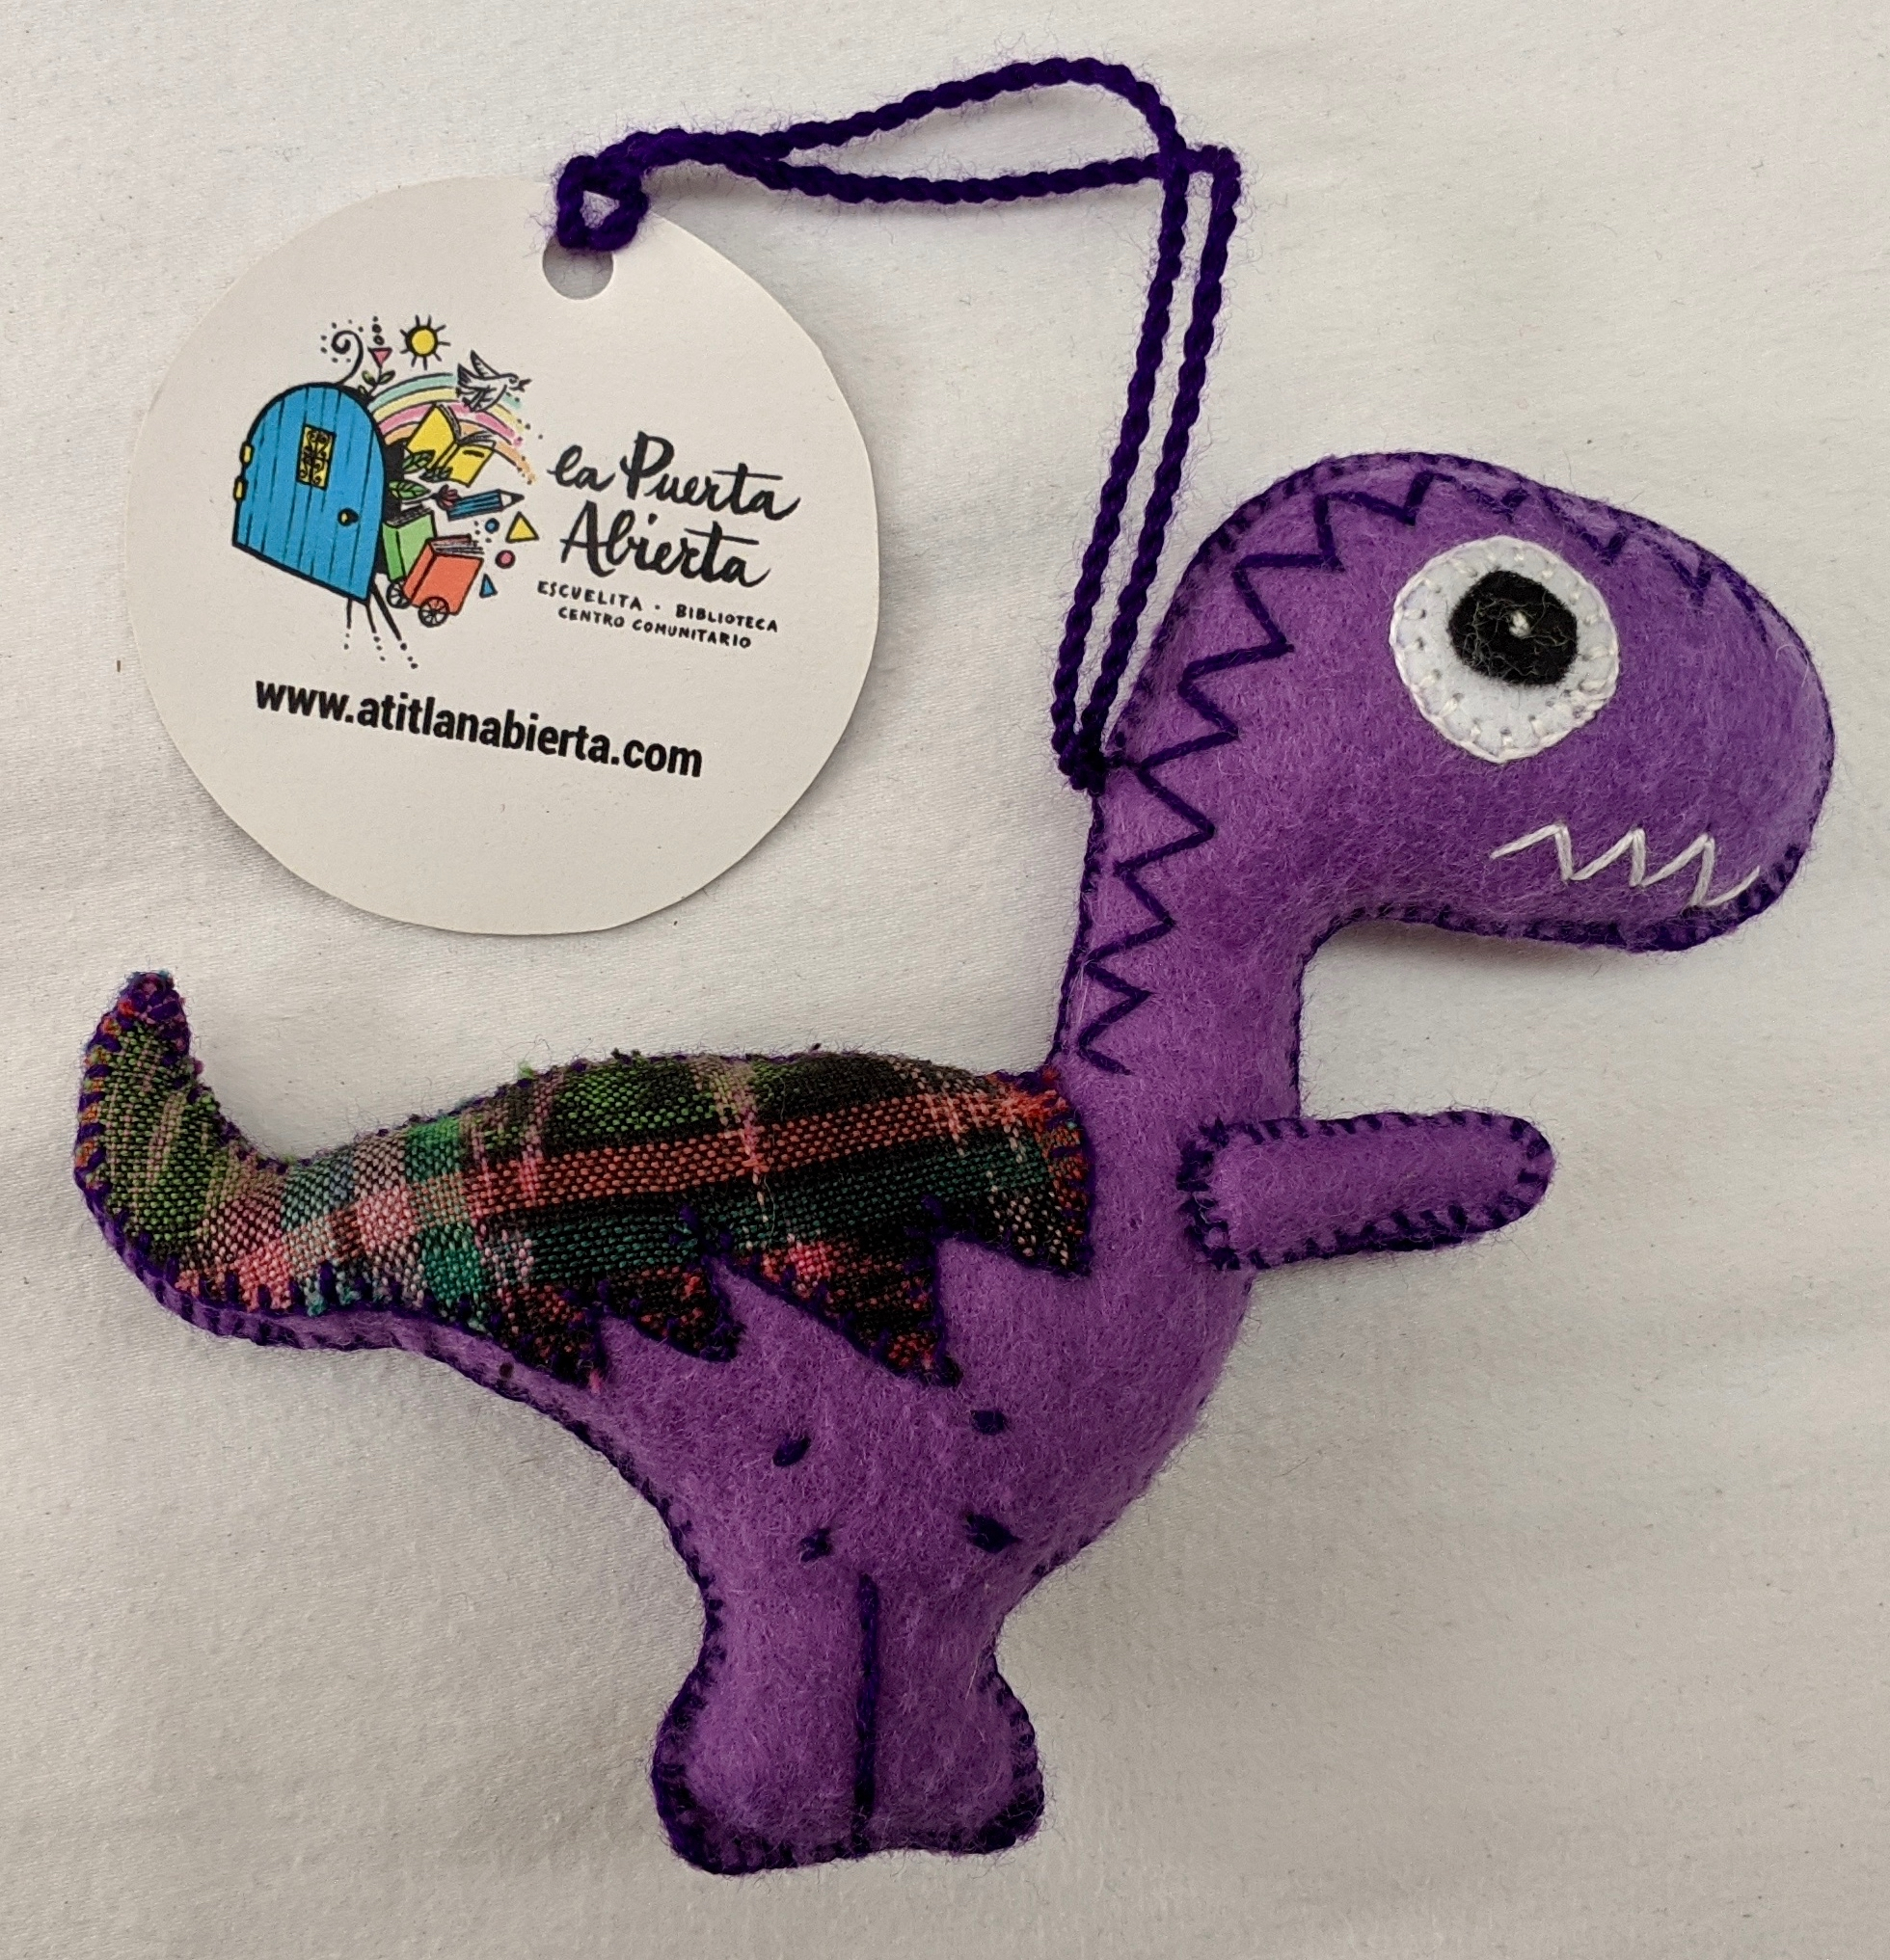 Tyrannosaurus Rex Ornament - Felt and Repurposed Traditional Fabric